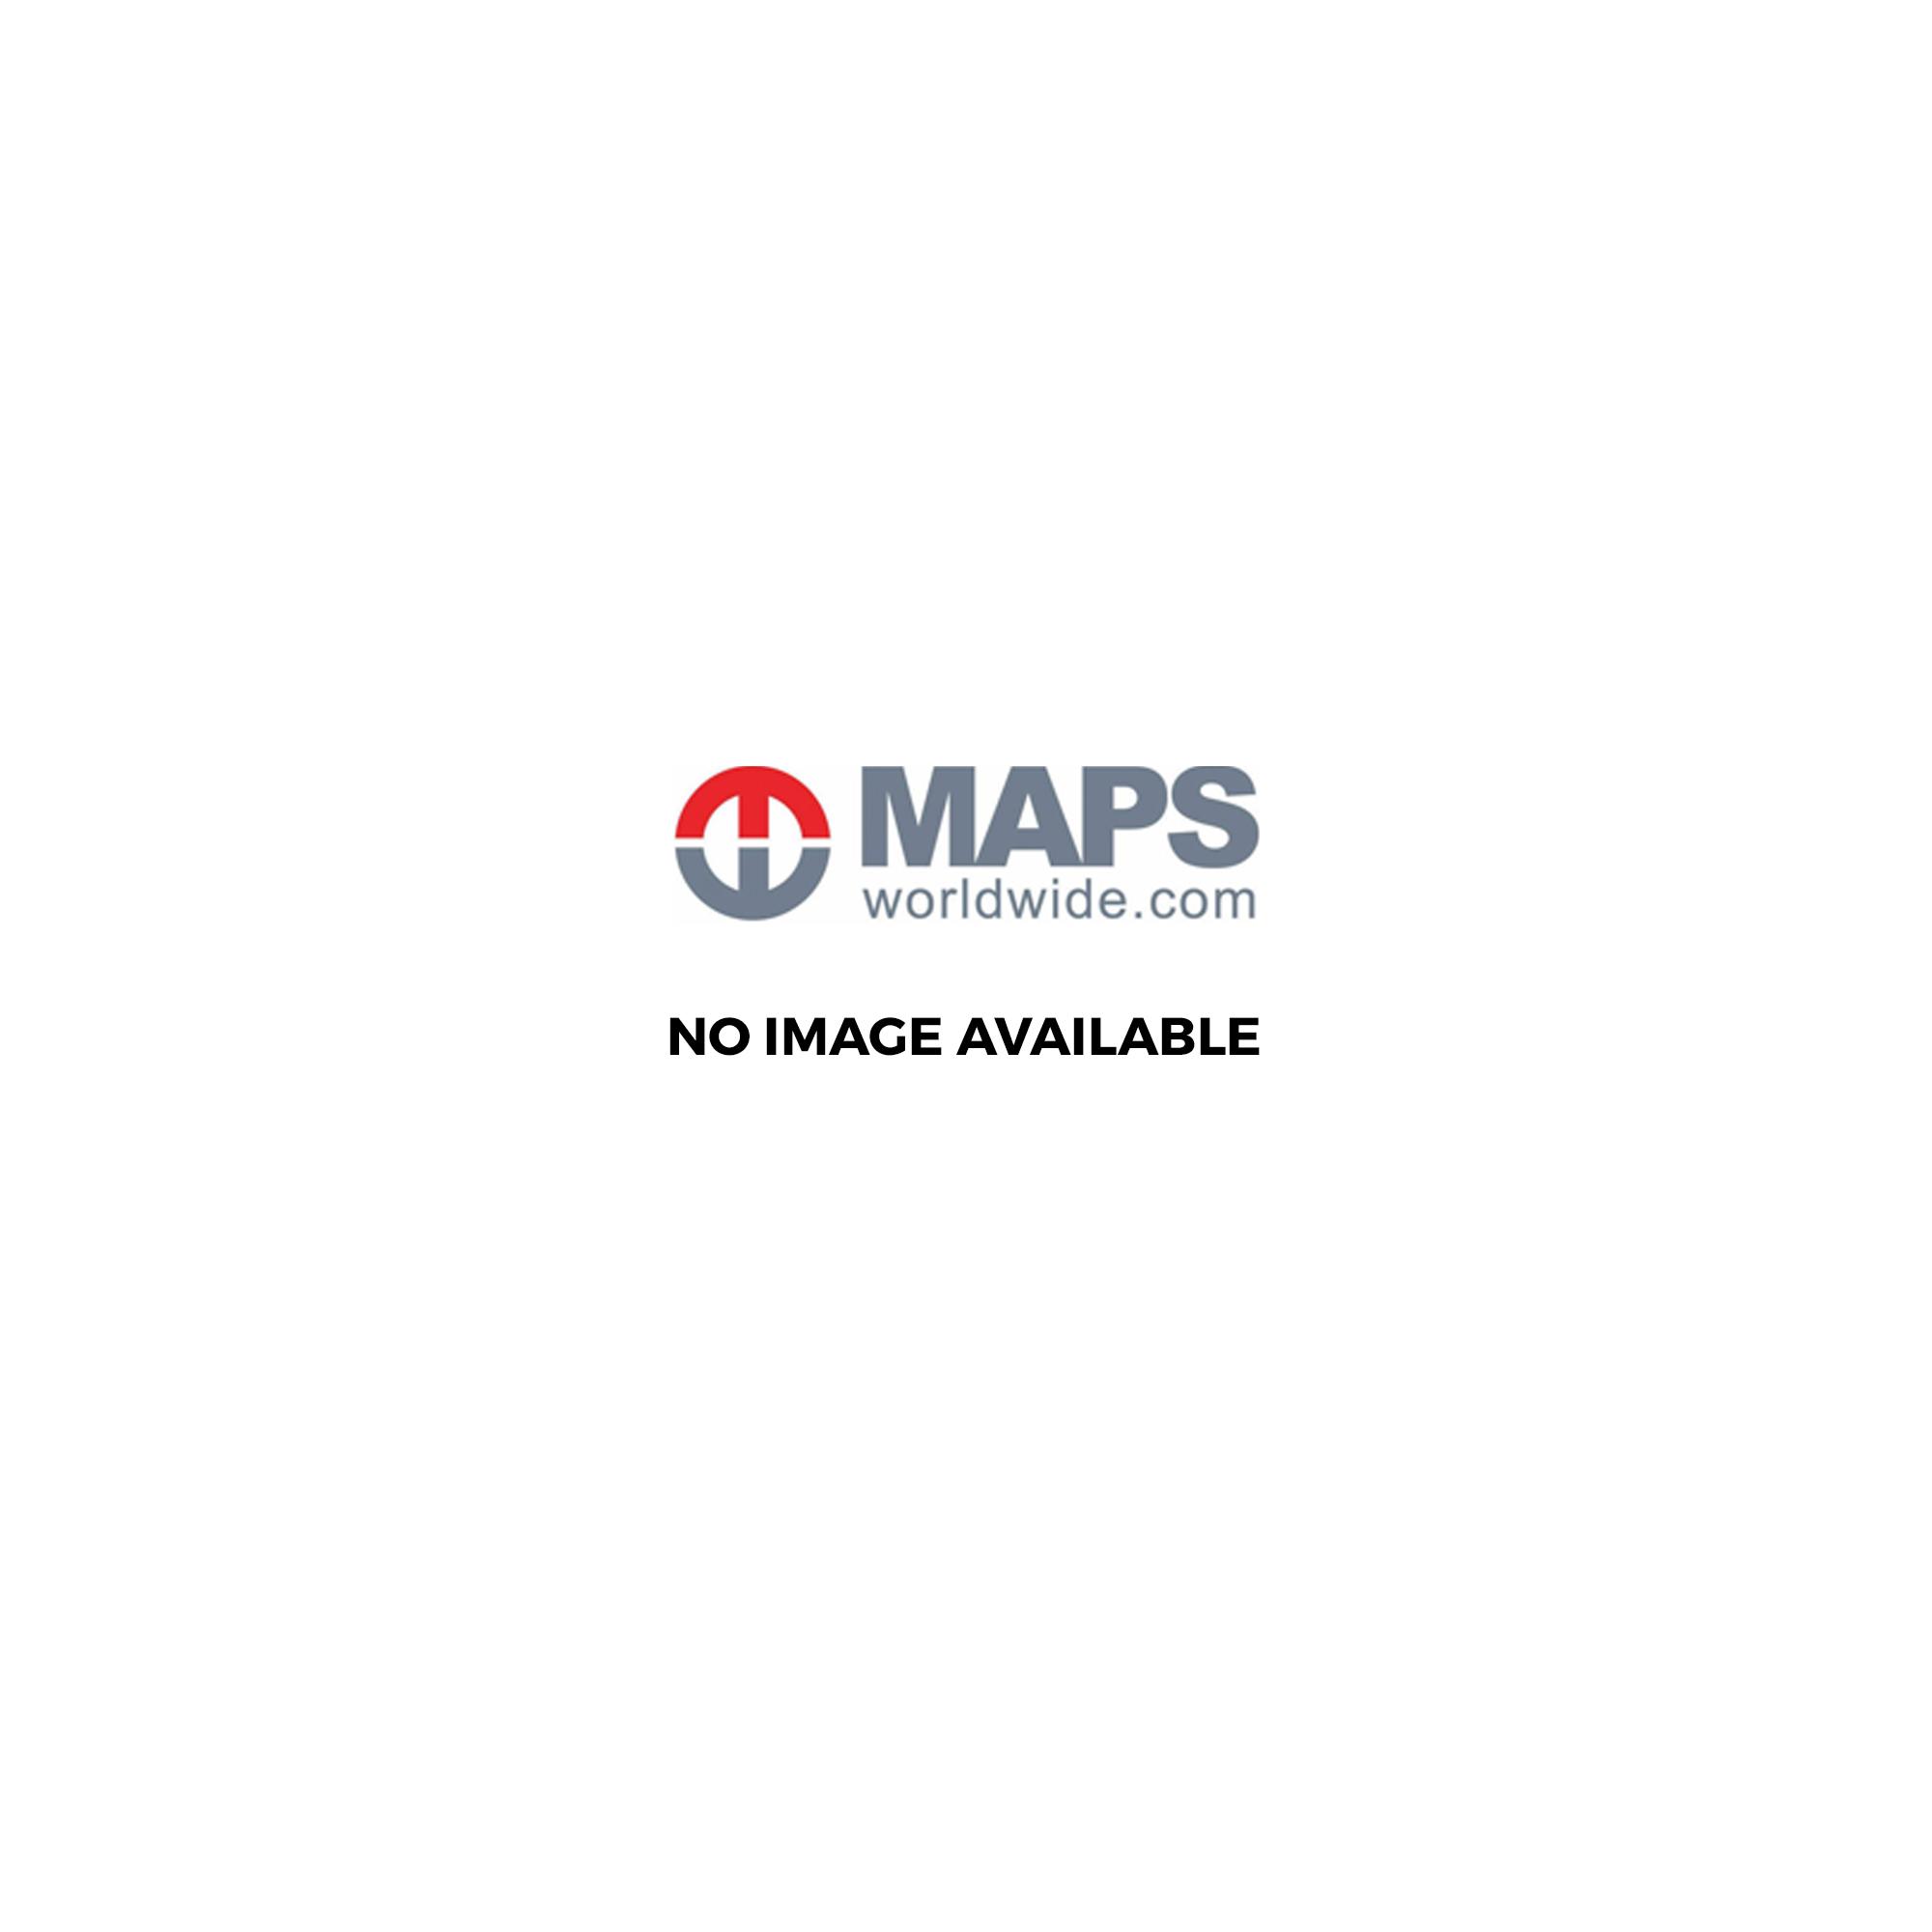 Kythnos Orama Map 310 Europe from Maps Worldwide UK